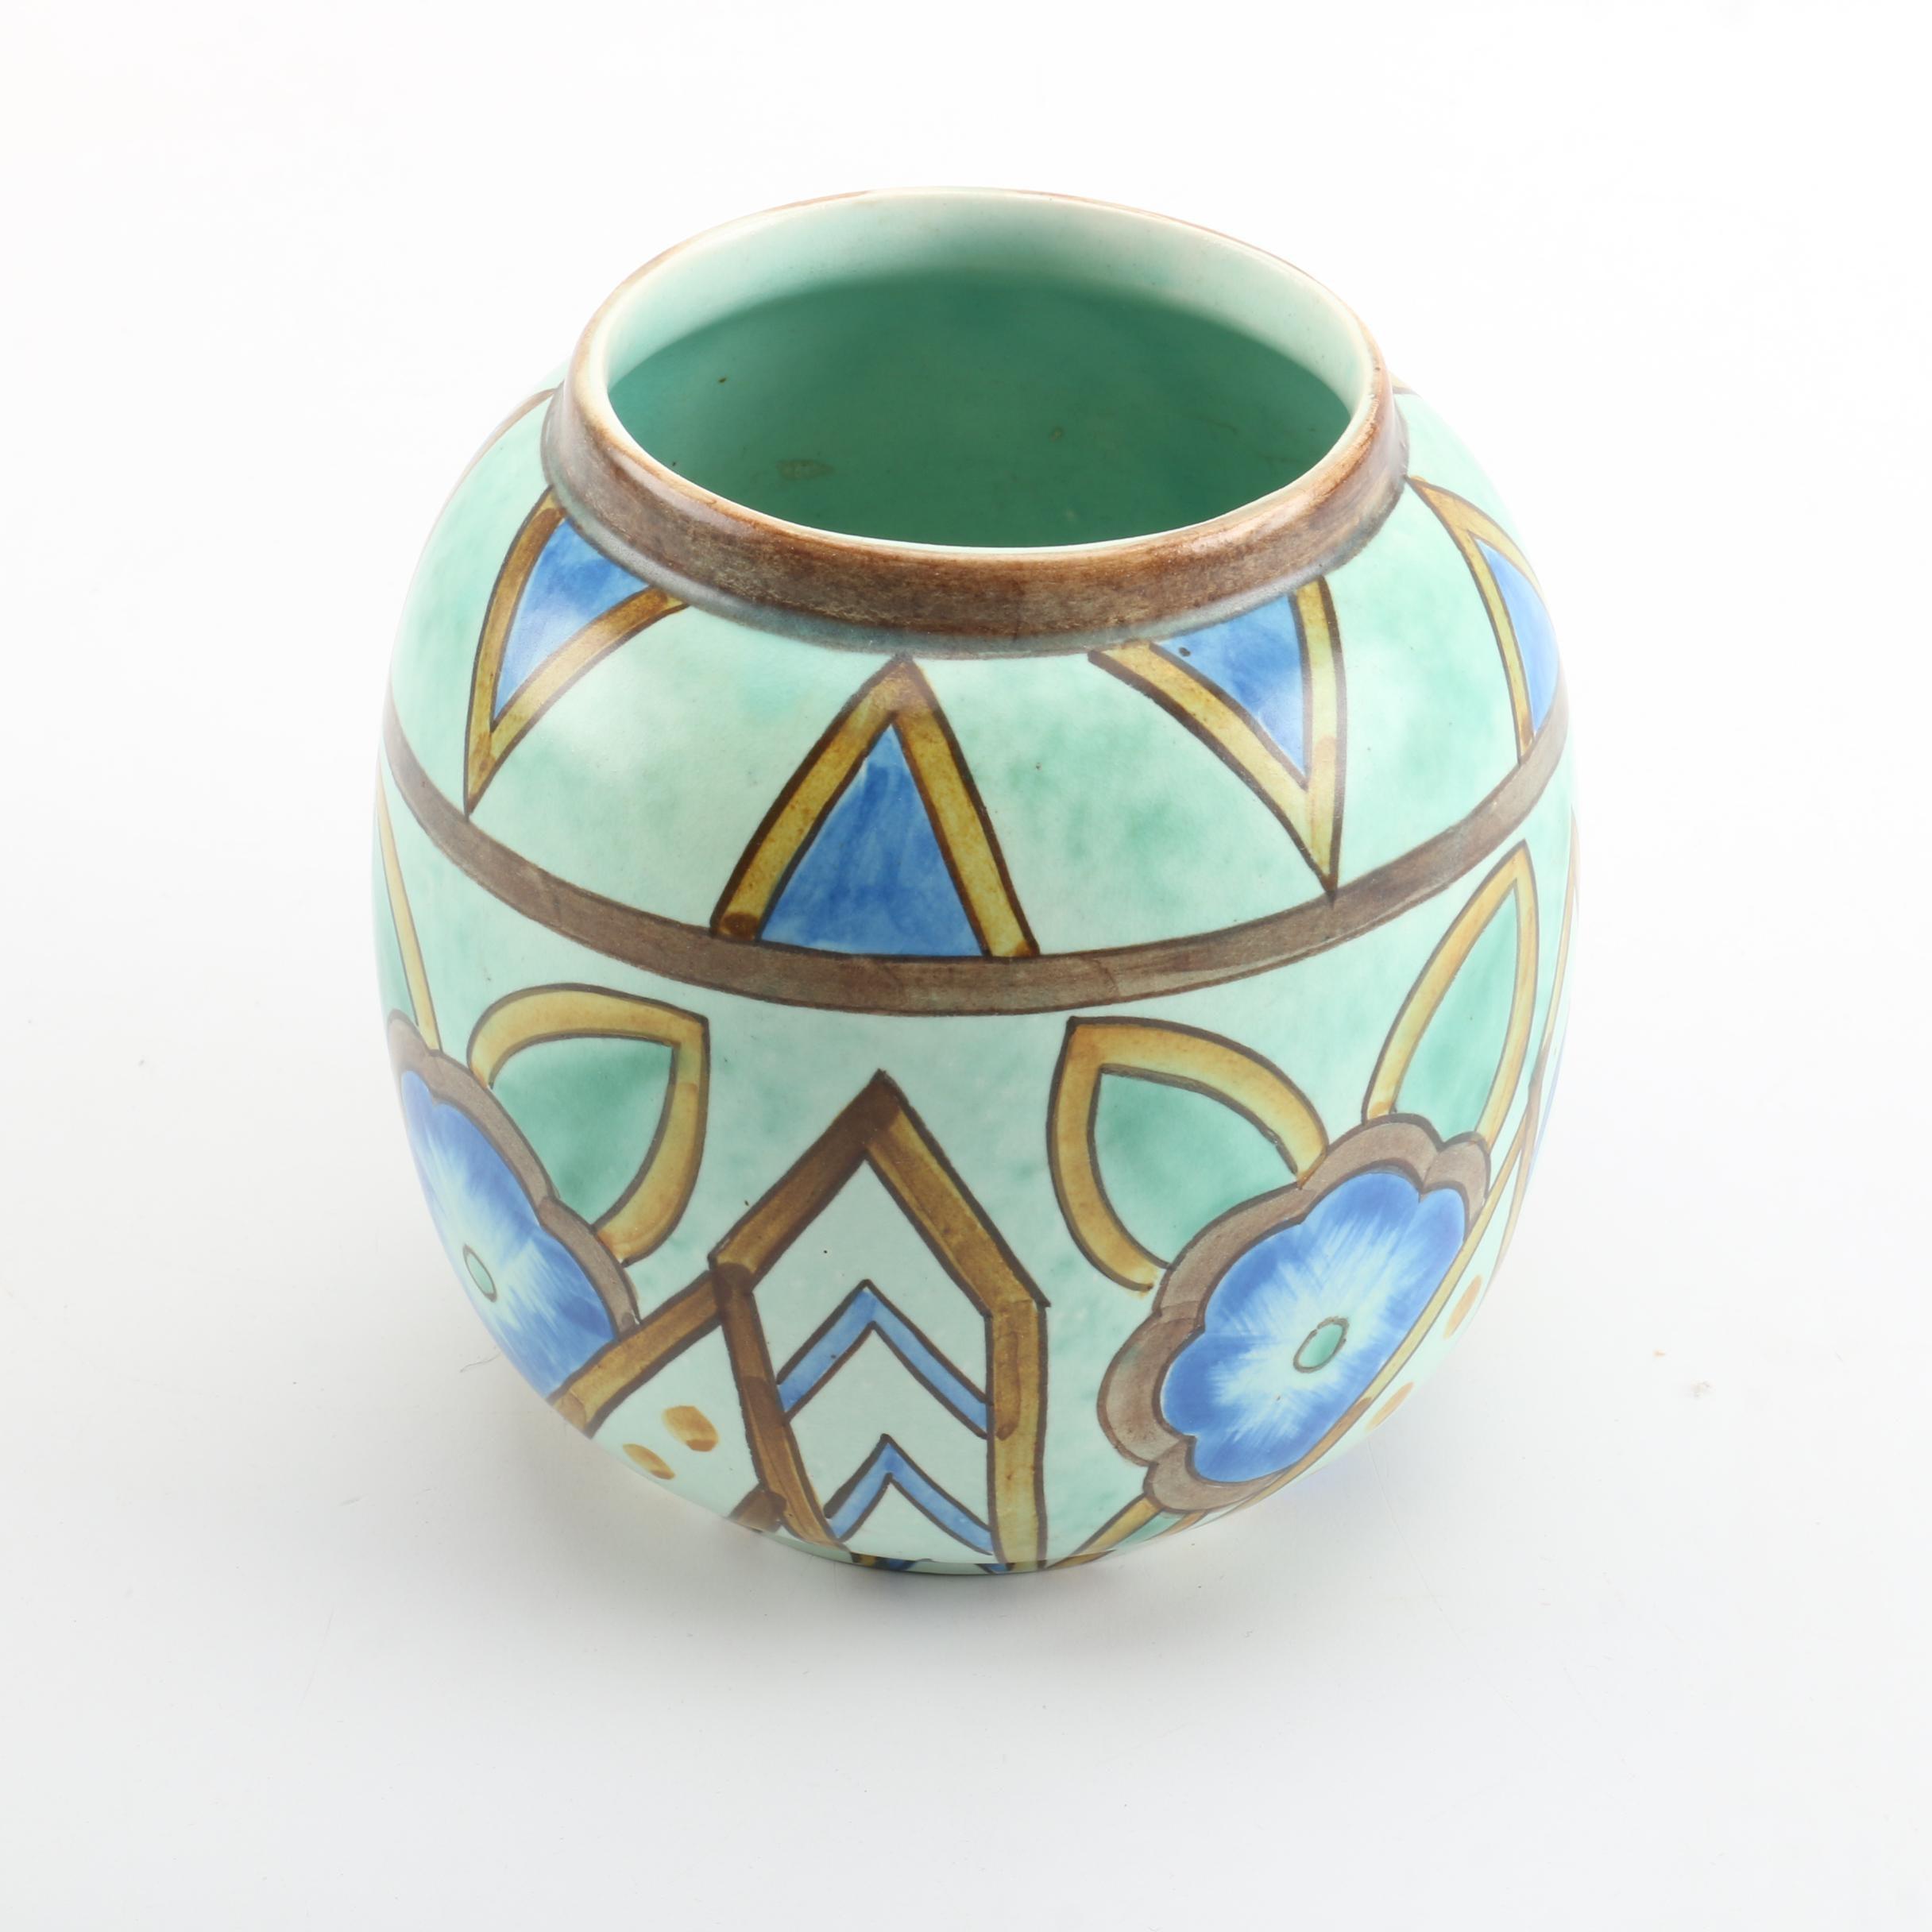 Wadeheath Flaxman Ware Art Deco Style Vase